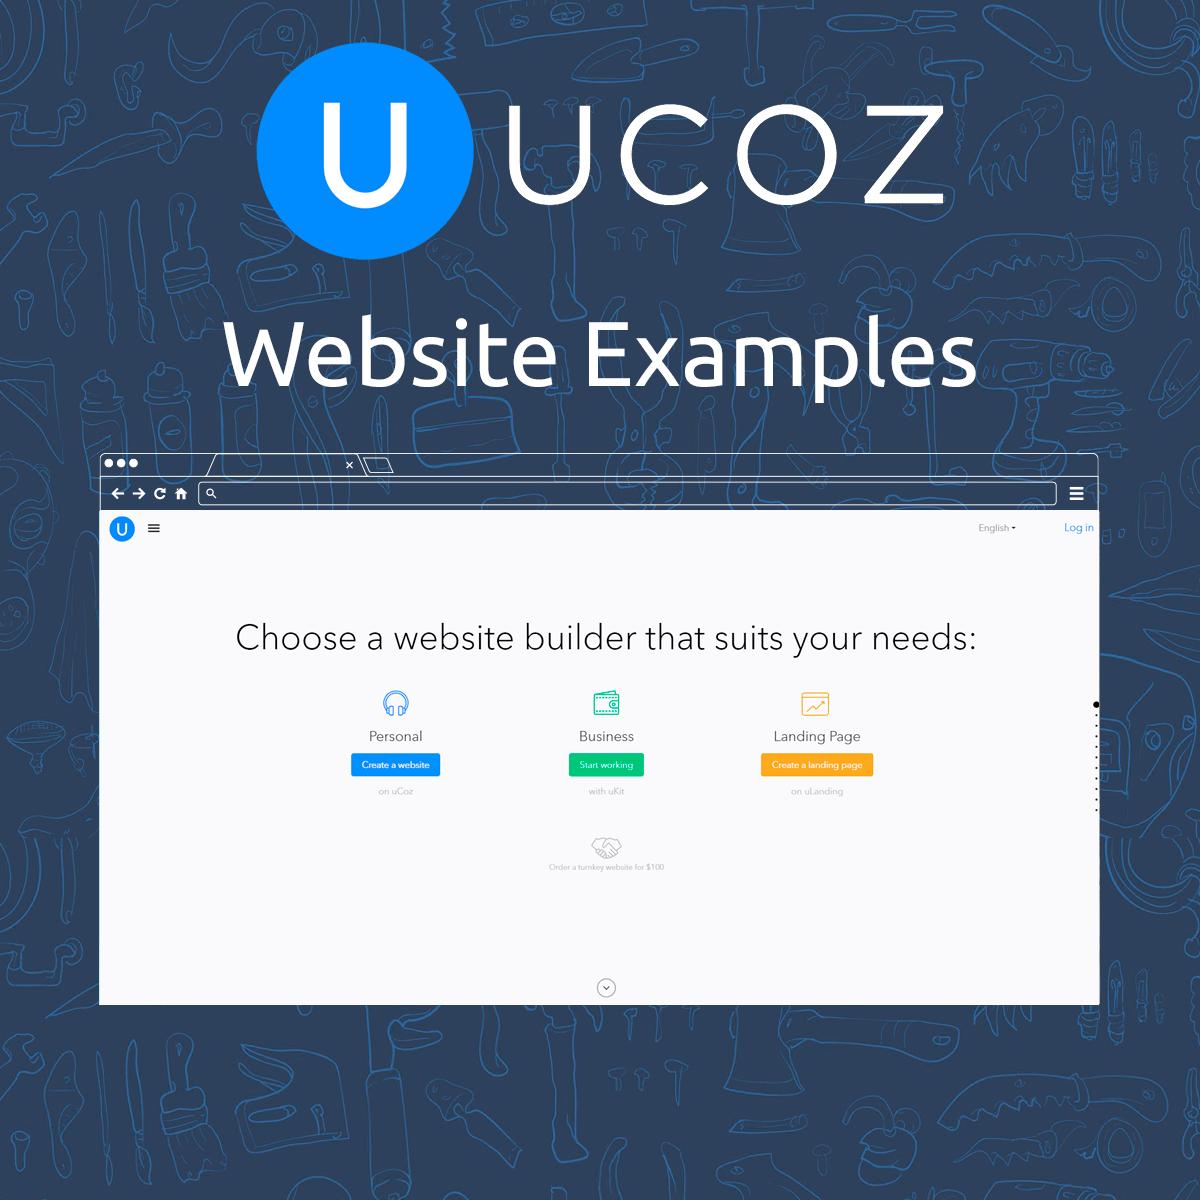 uCoz Website Examples